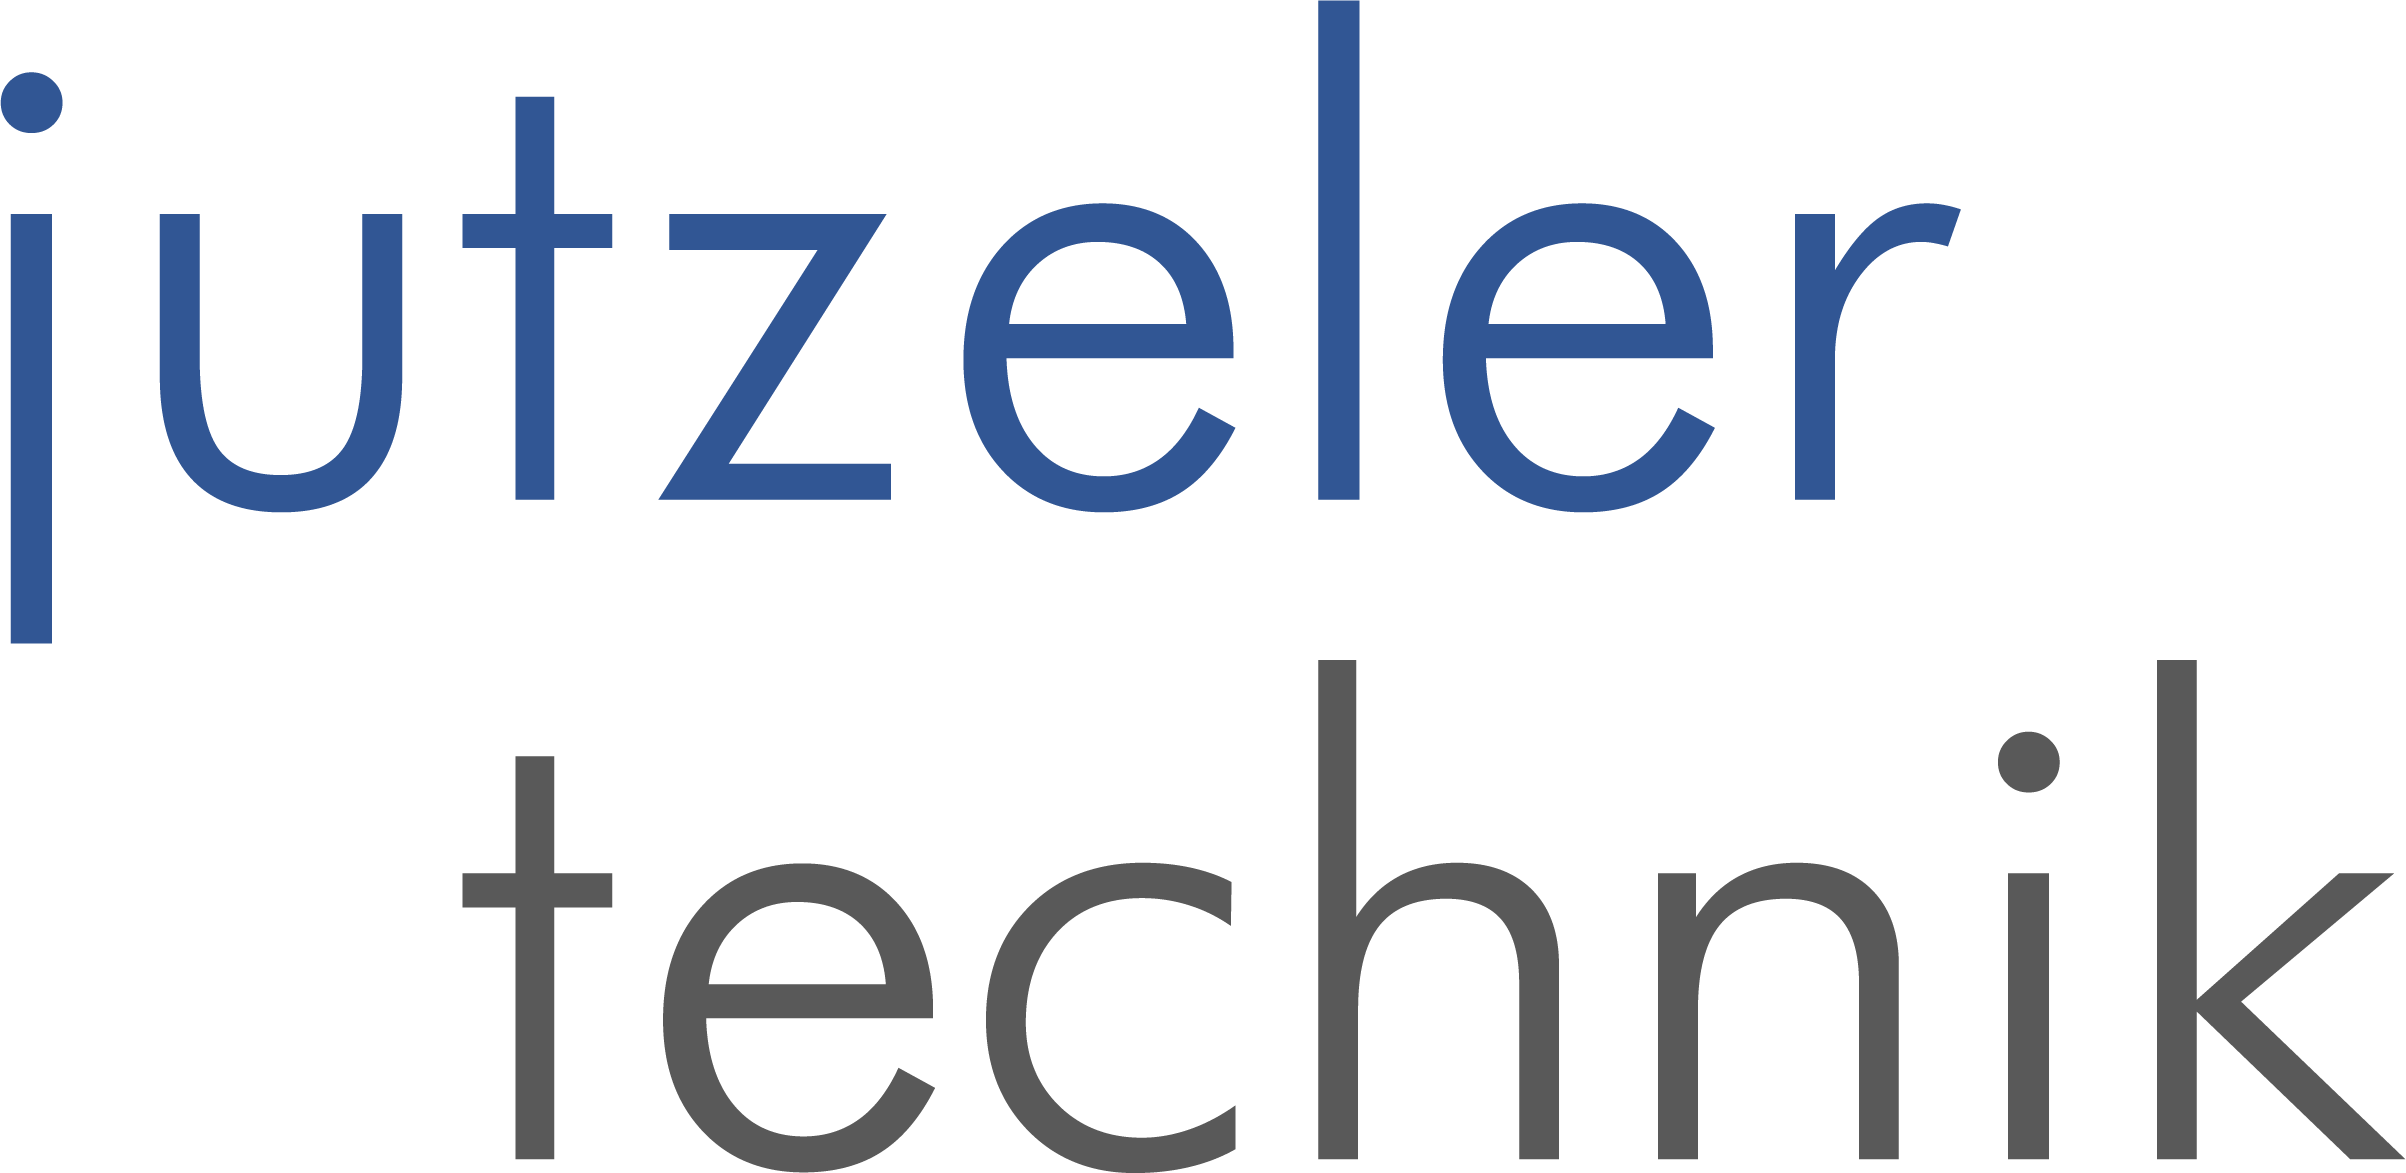 jutzeler technik